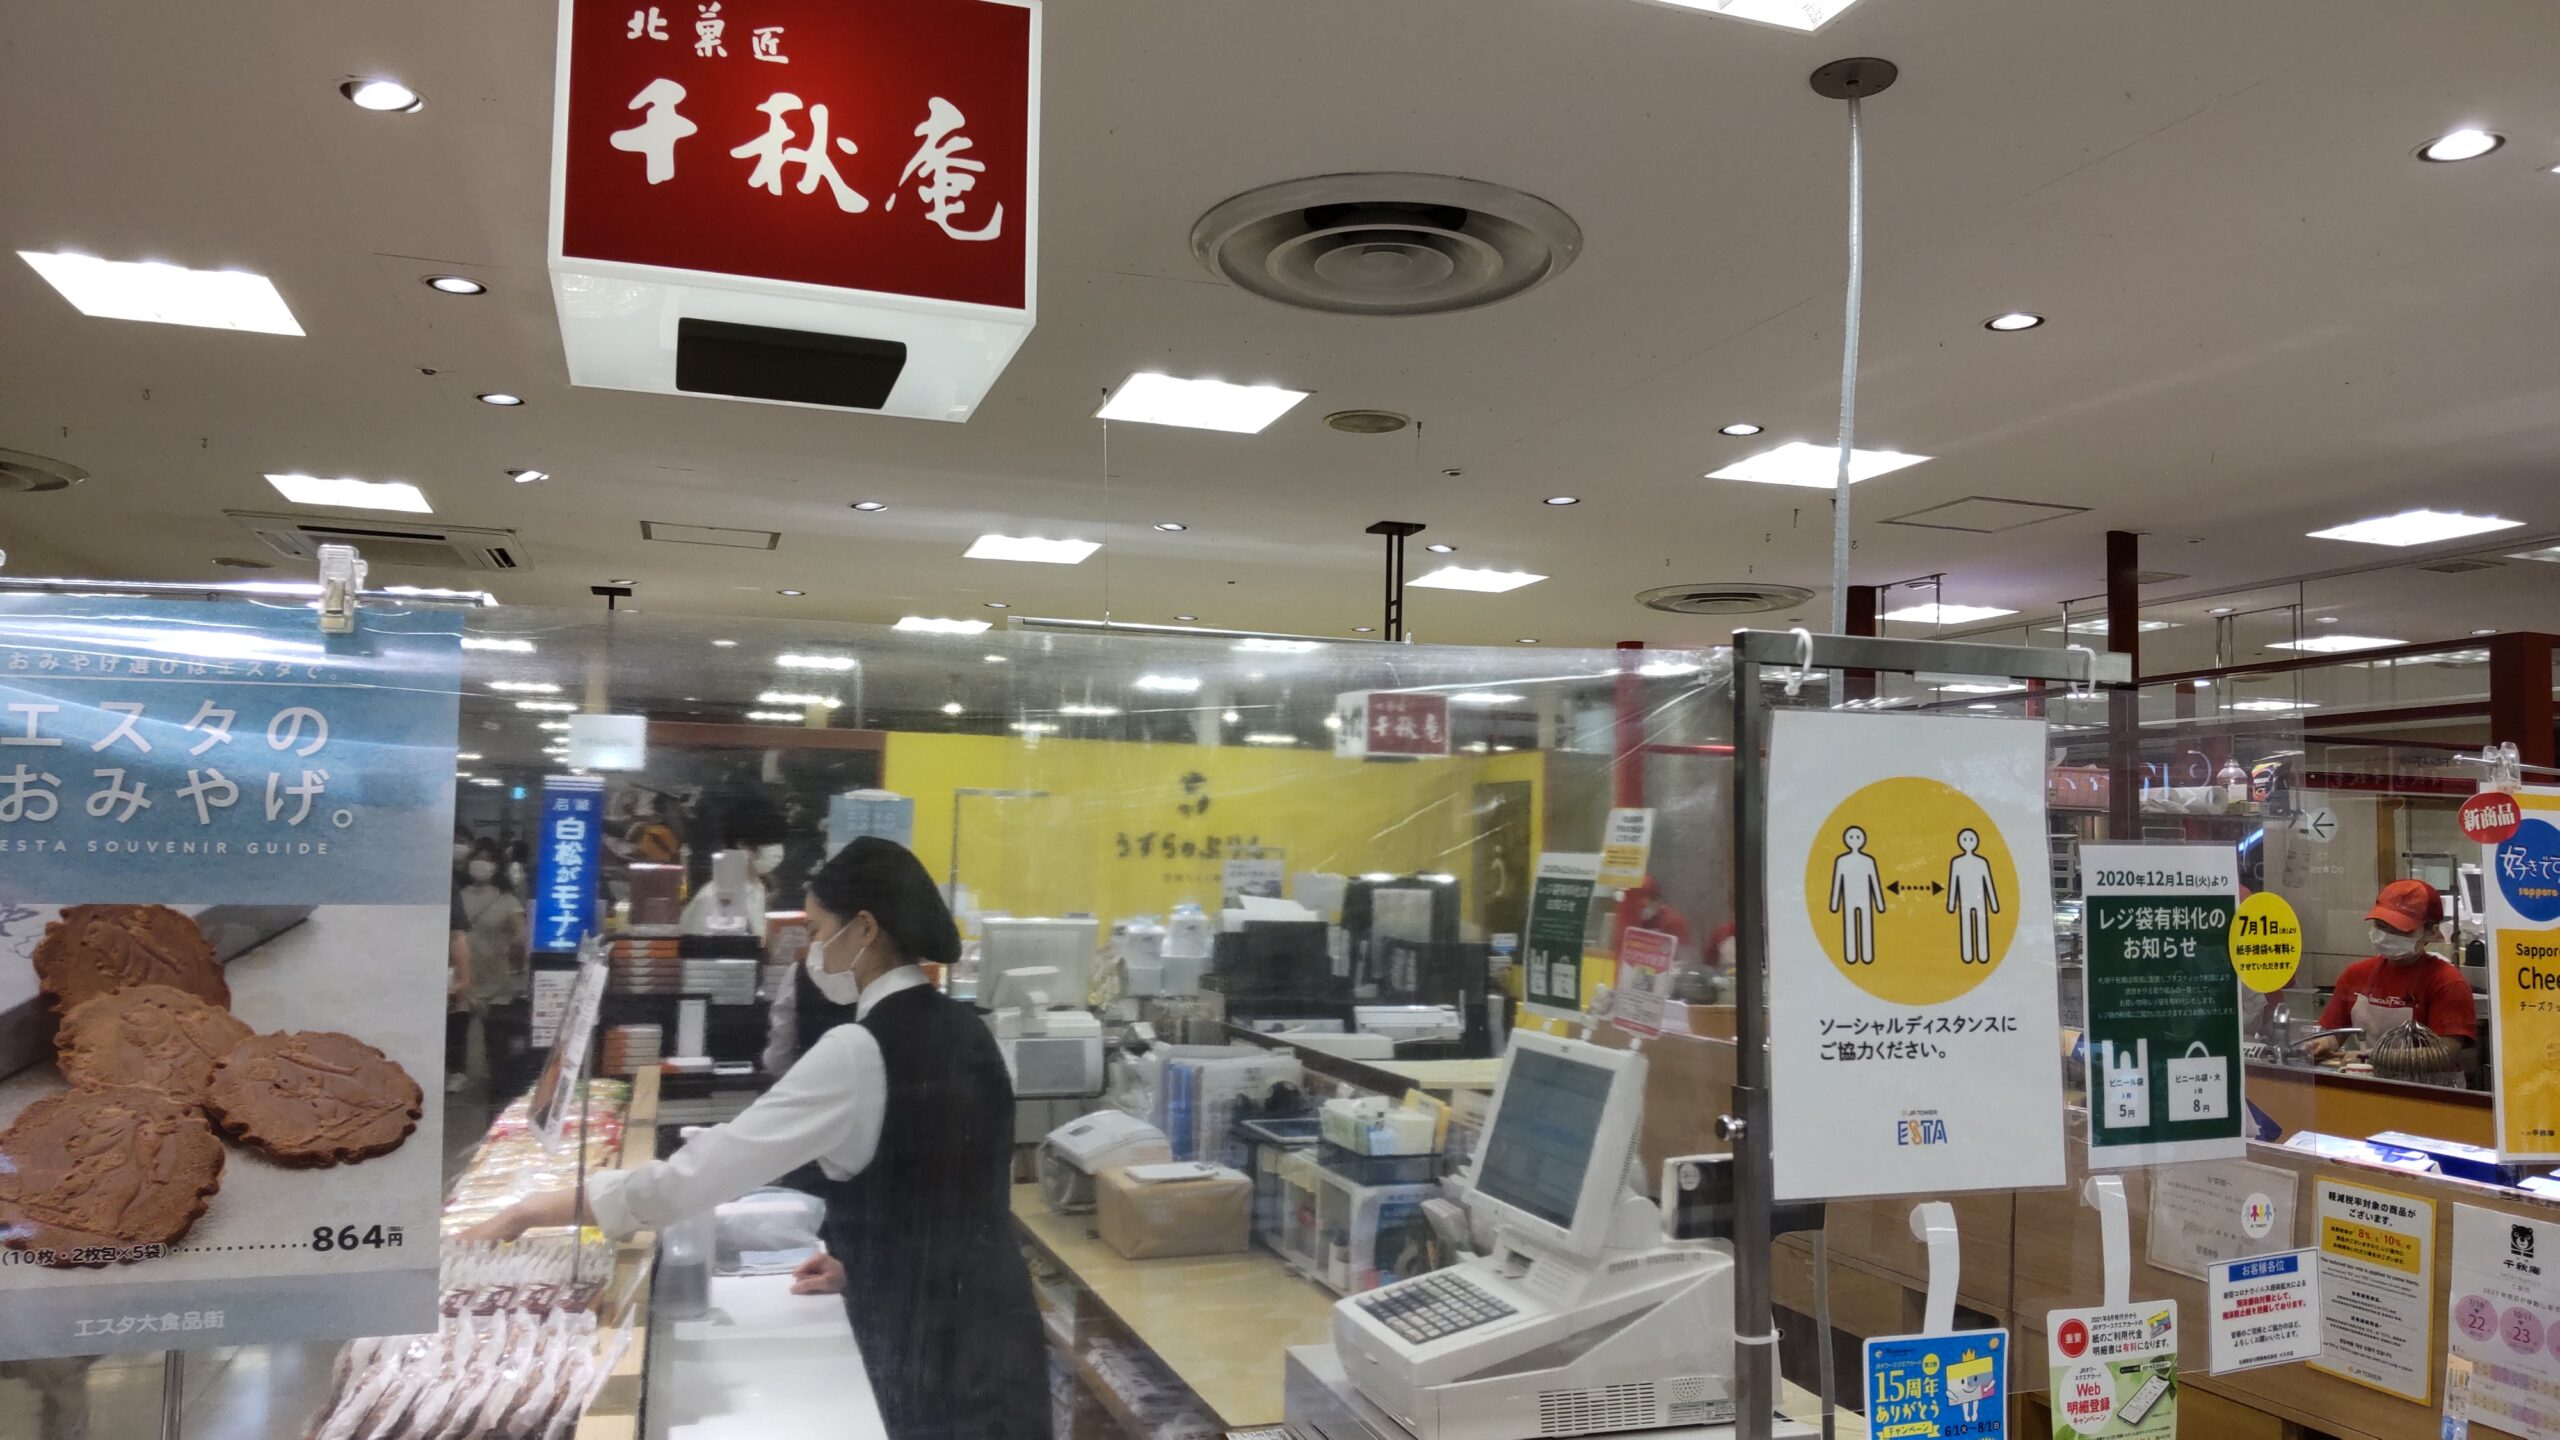 千秋庵 札幌エスタ店